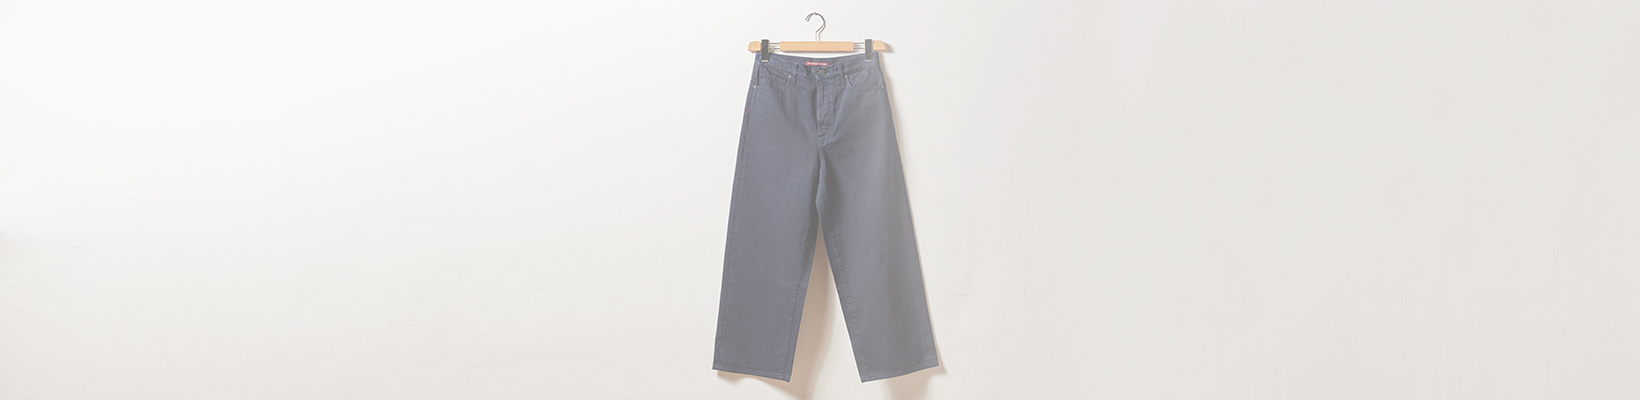 Jeans Wide Cropped pour femmes